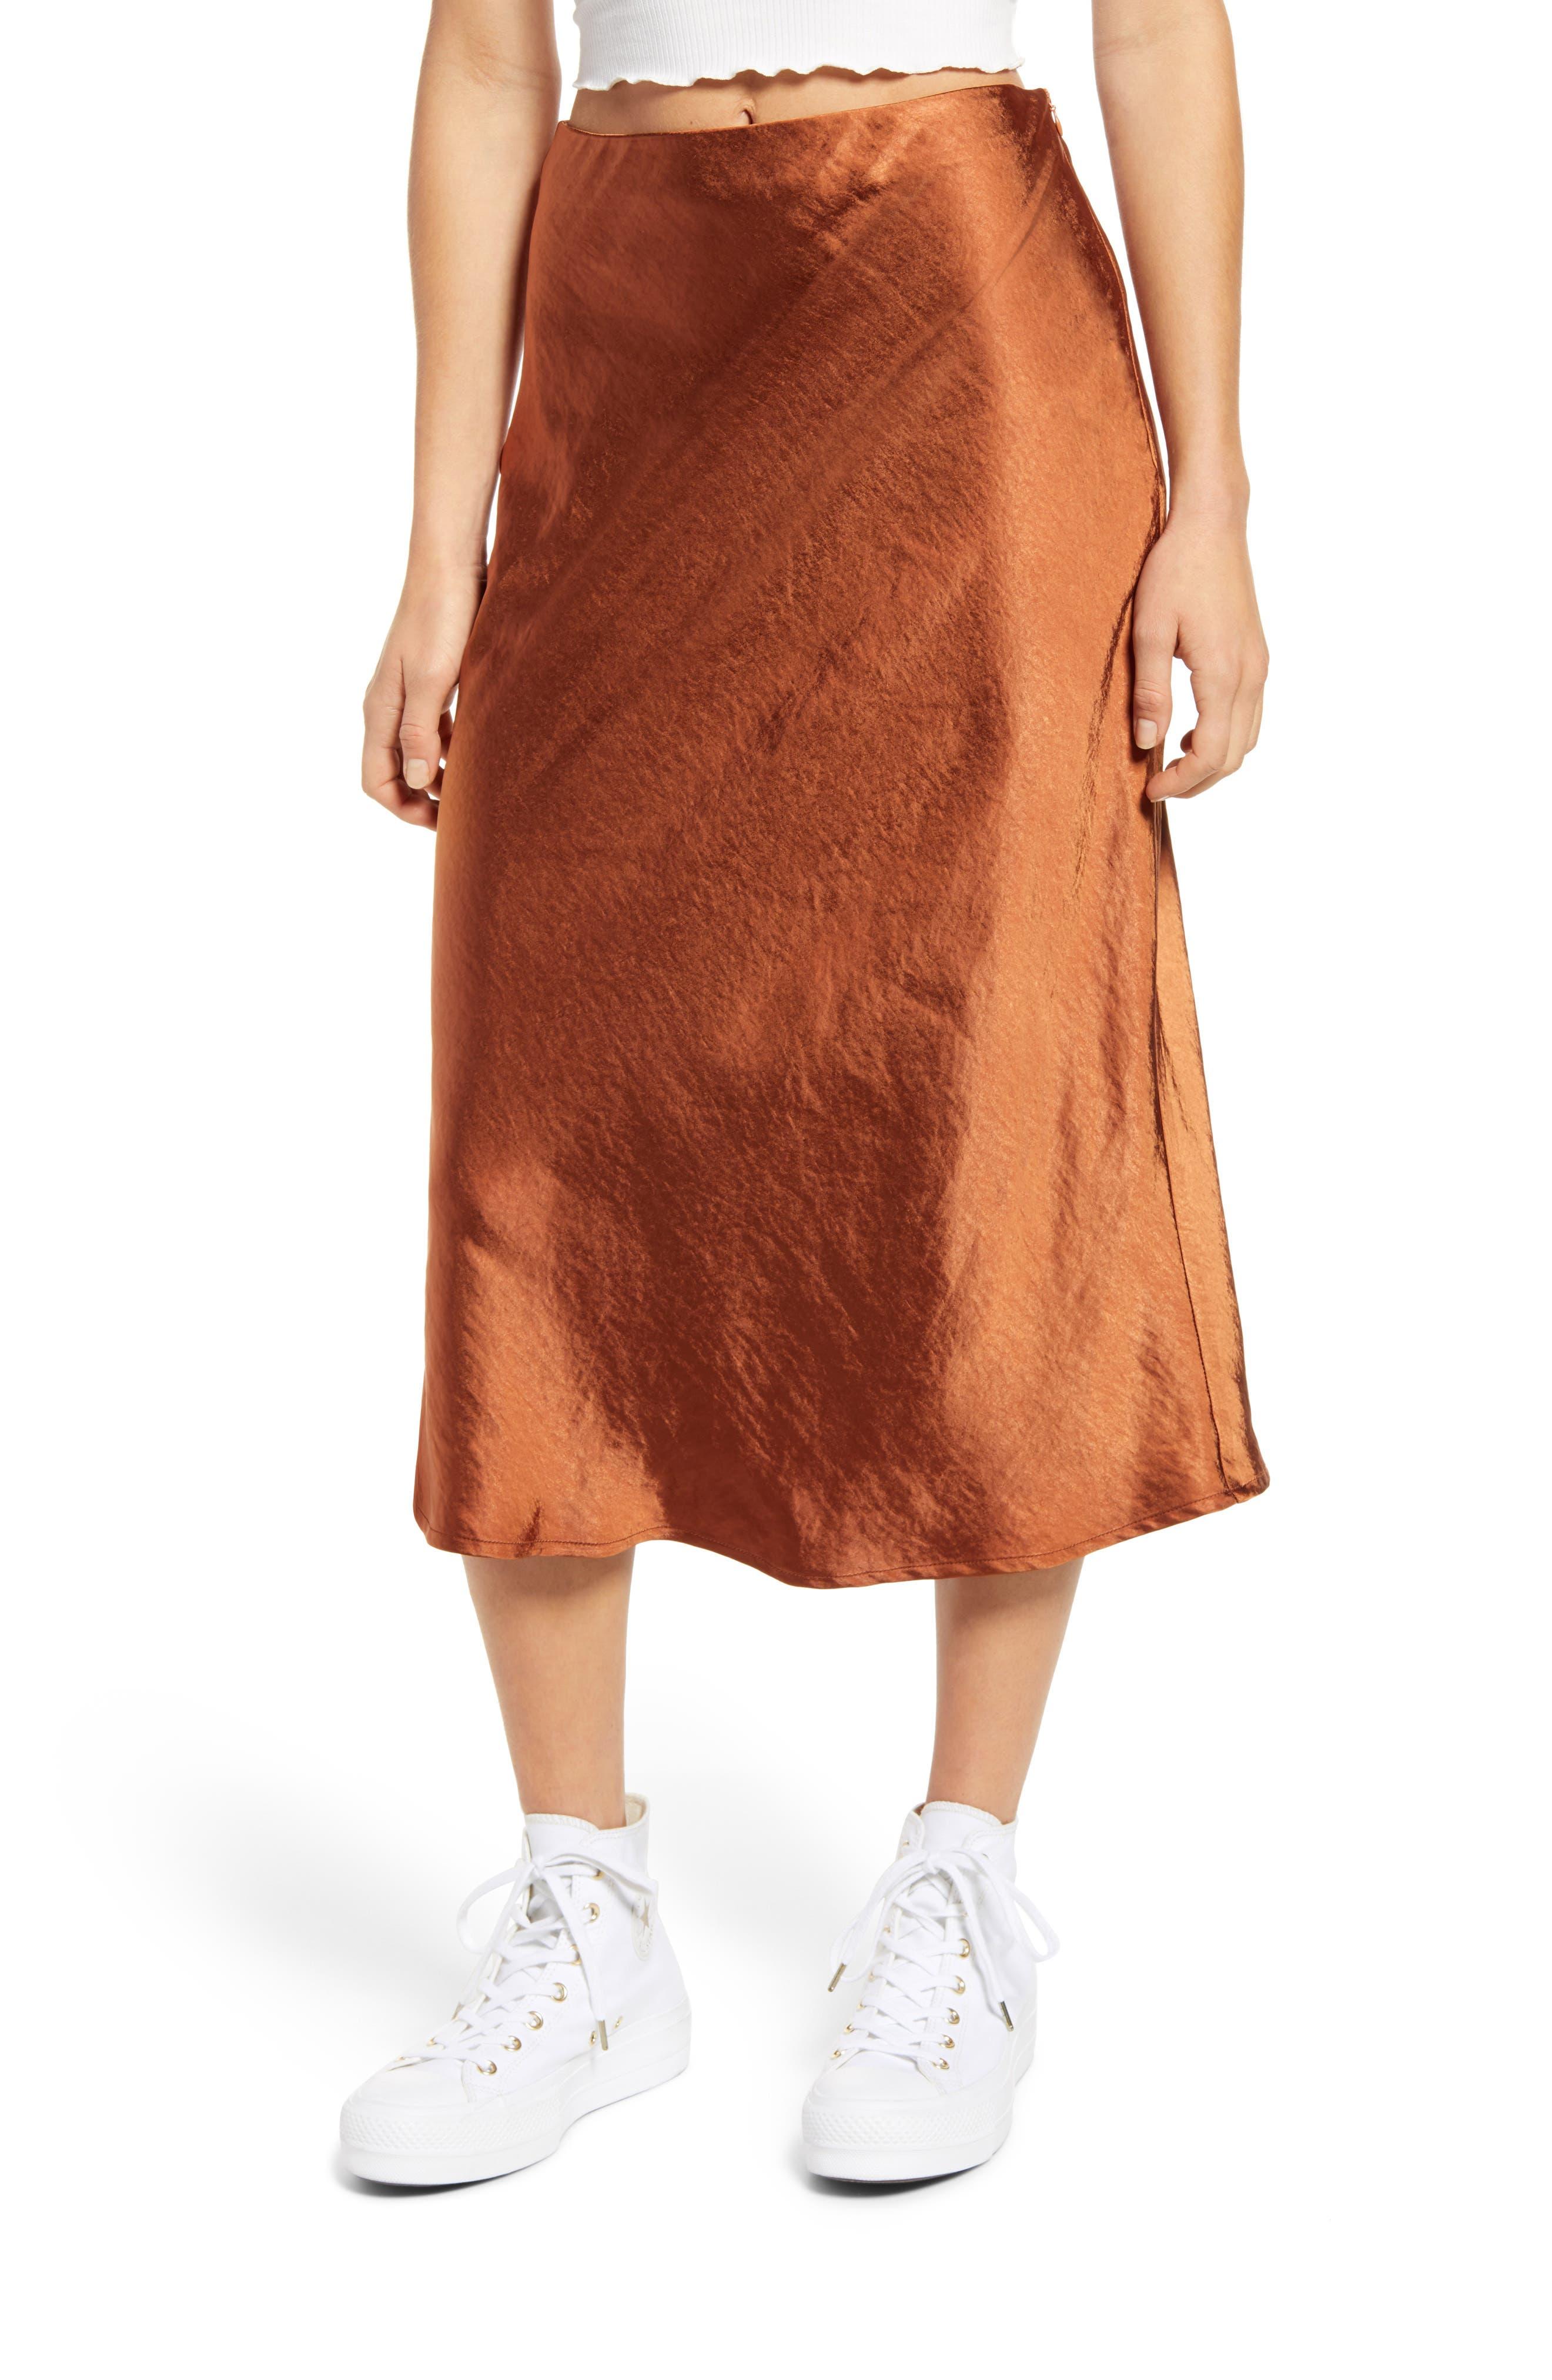 70s Dresses – Disco Dress, Hippie Dress, Wrap Dress Womens Lulus Satin A-Line Midi Skirt Size X-Small - Brown $48.00 AT vintagedancer.com